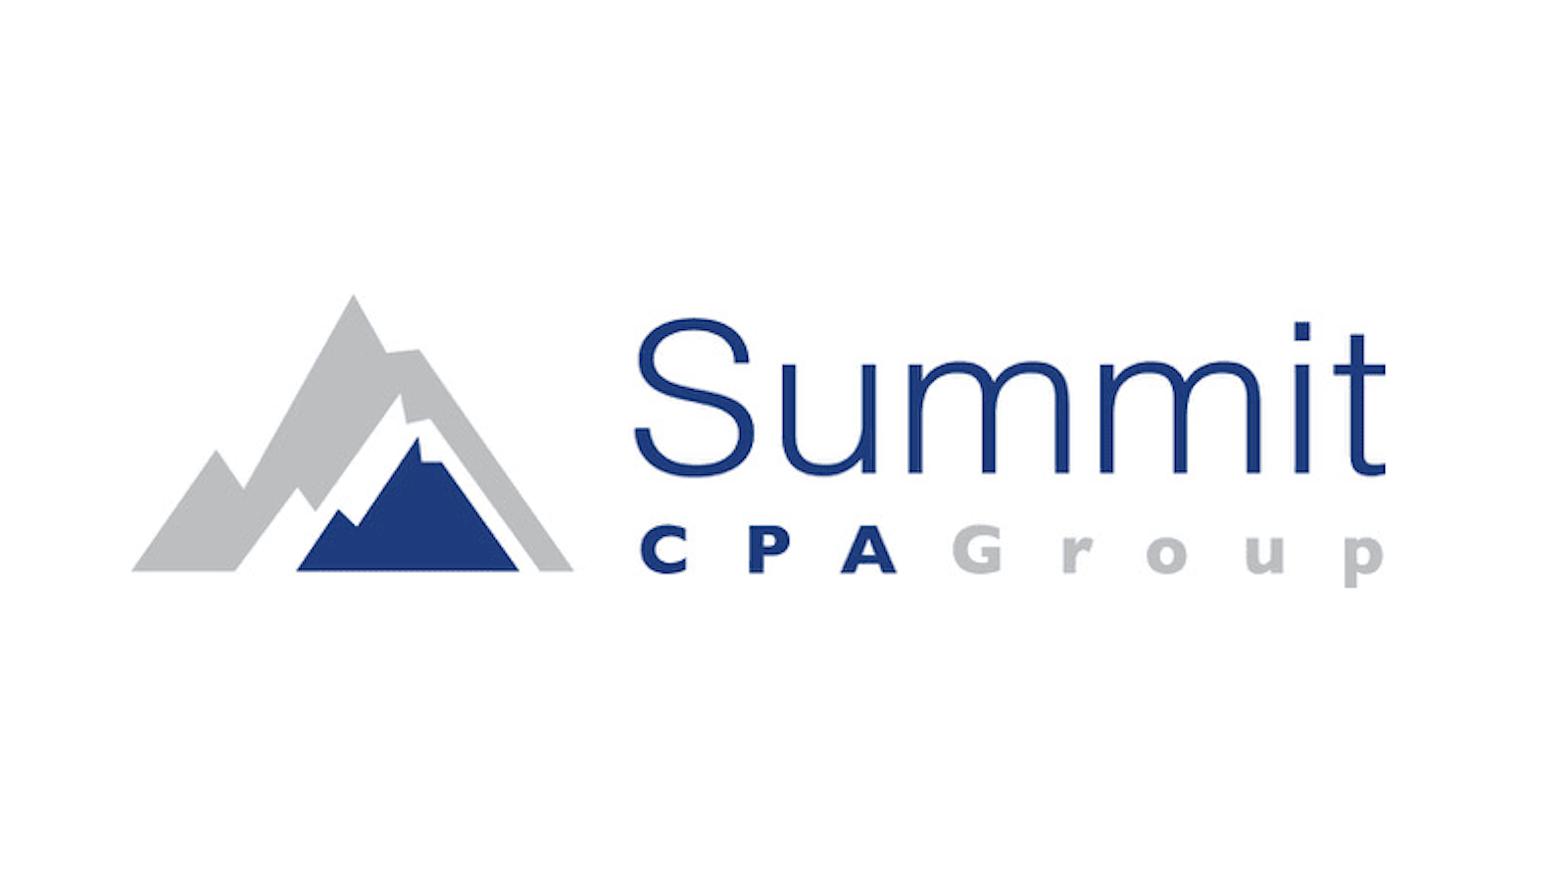 The Summit CPA logo